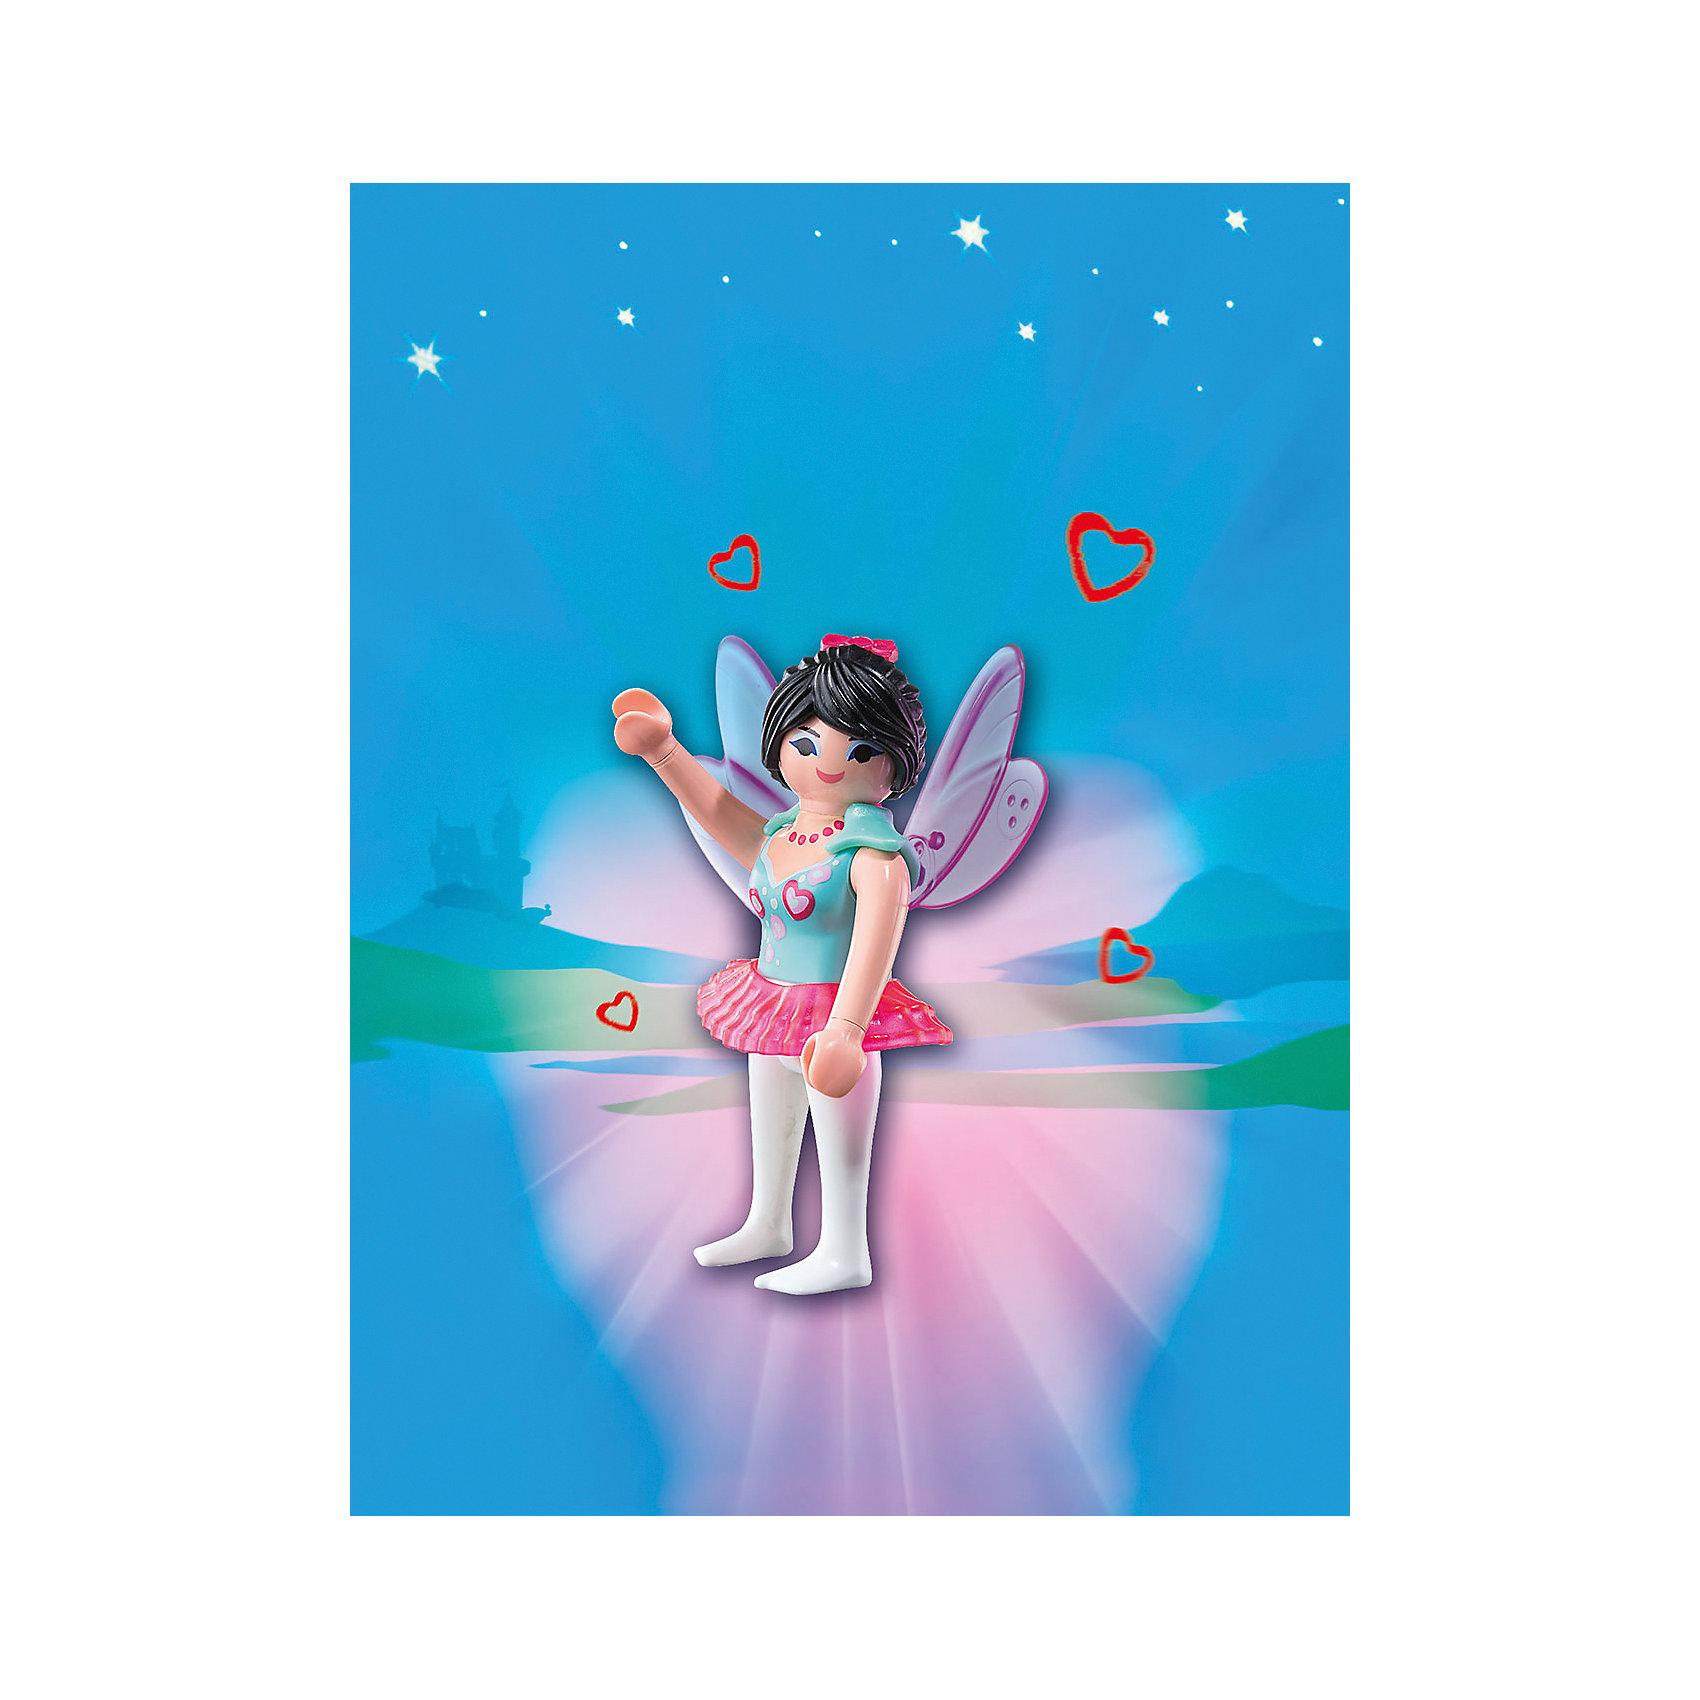 PLAYMOBIL® Друзья: Добрая фея с кольцом, PLAYMOBIL playmobil® экстра набор фея с оленем playmobil